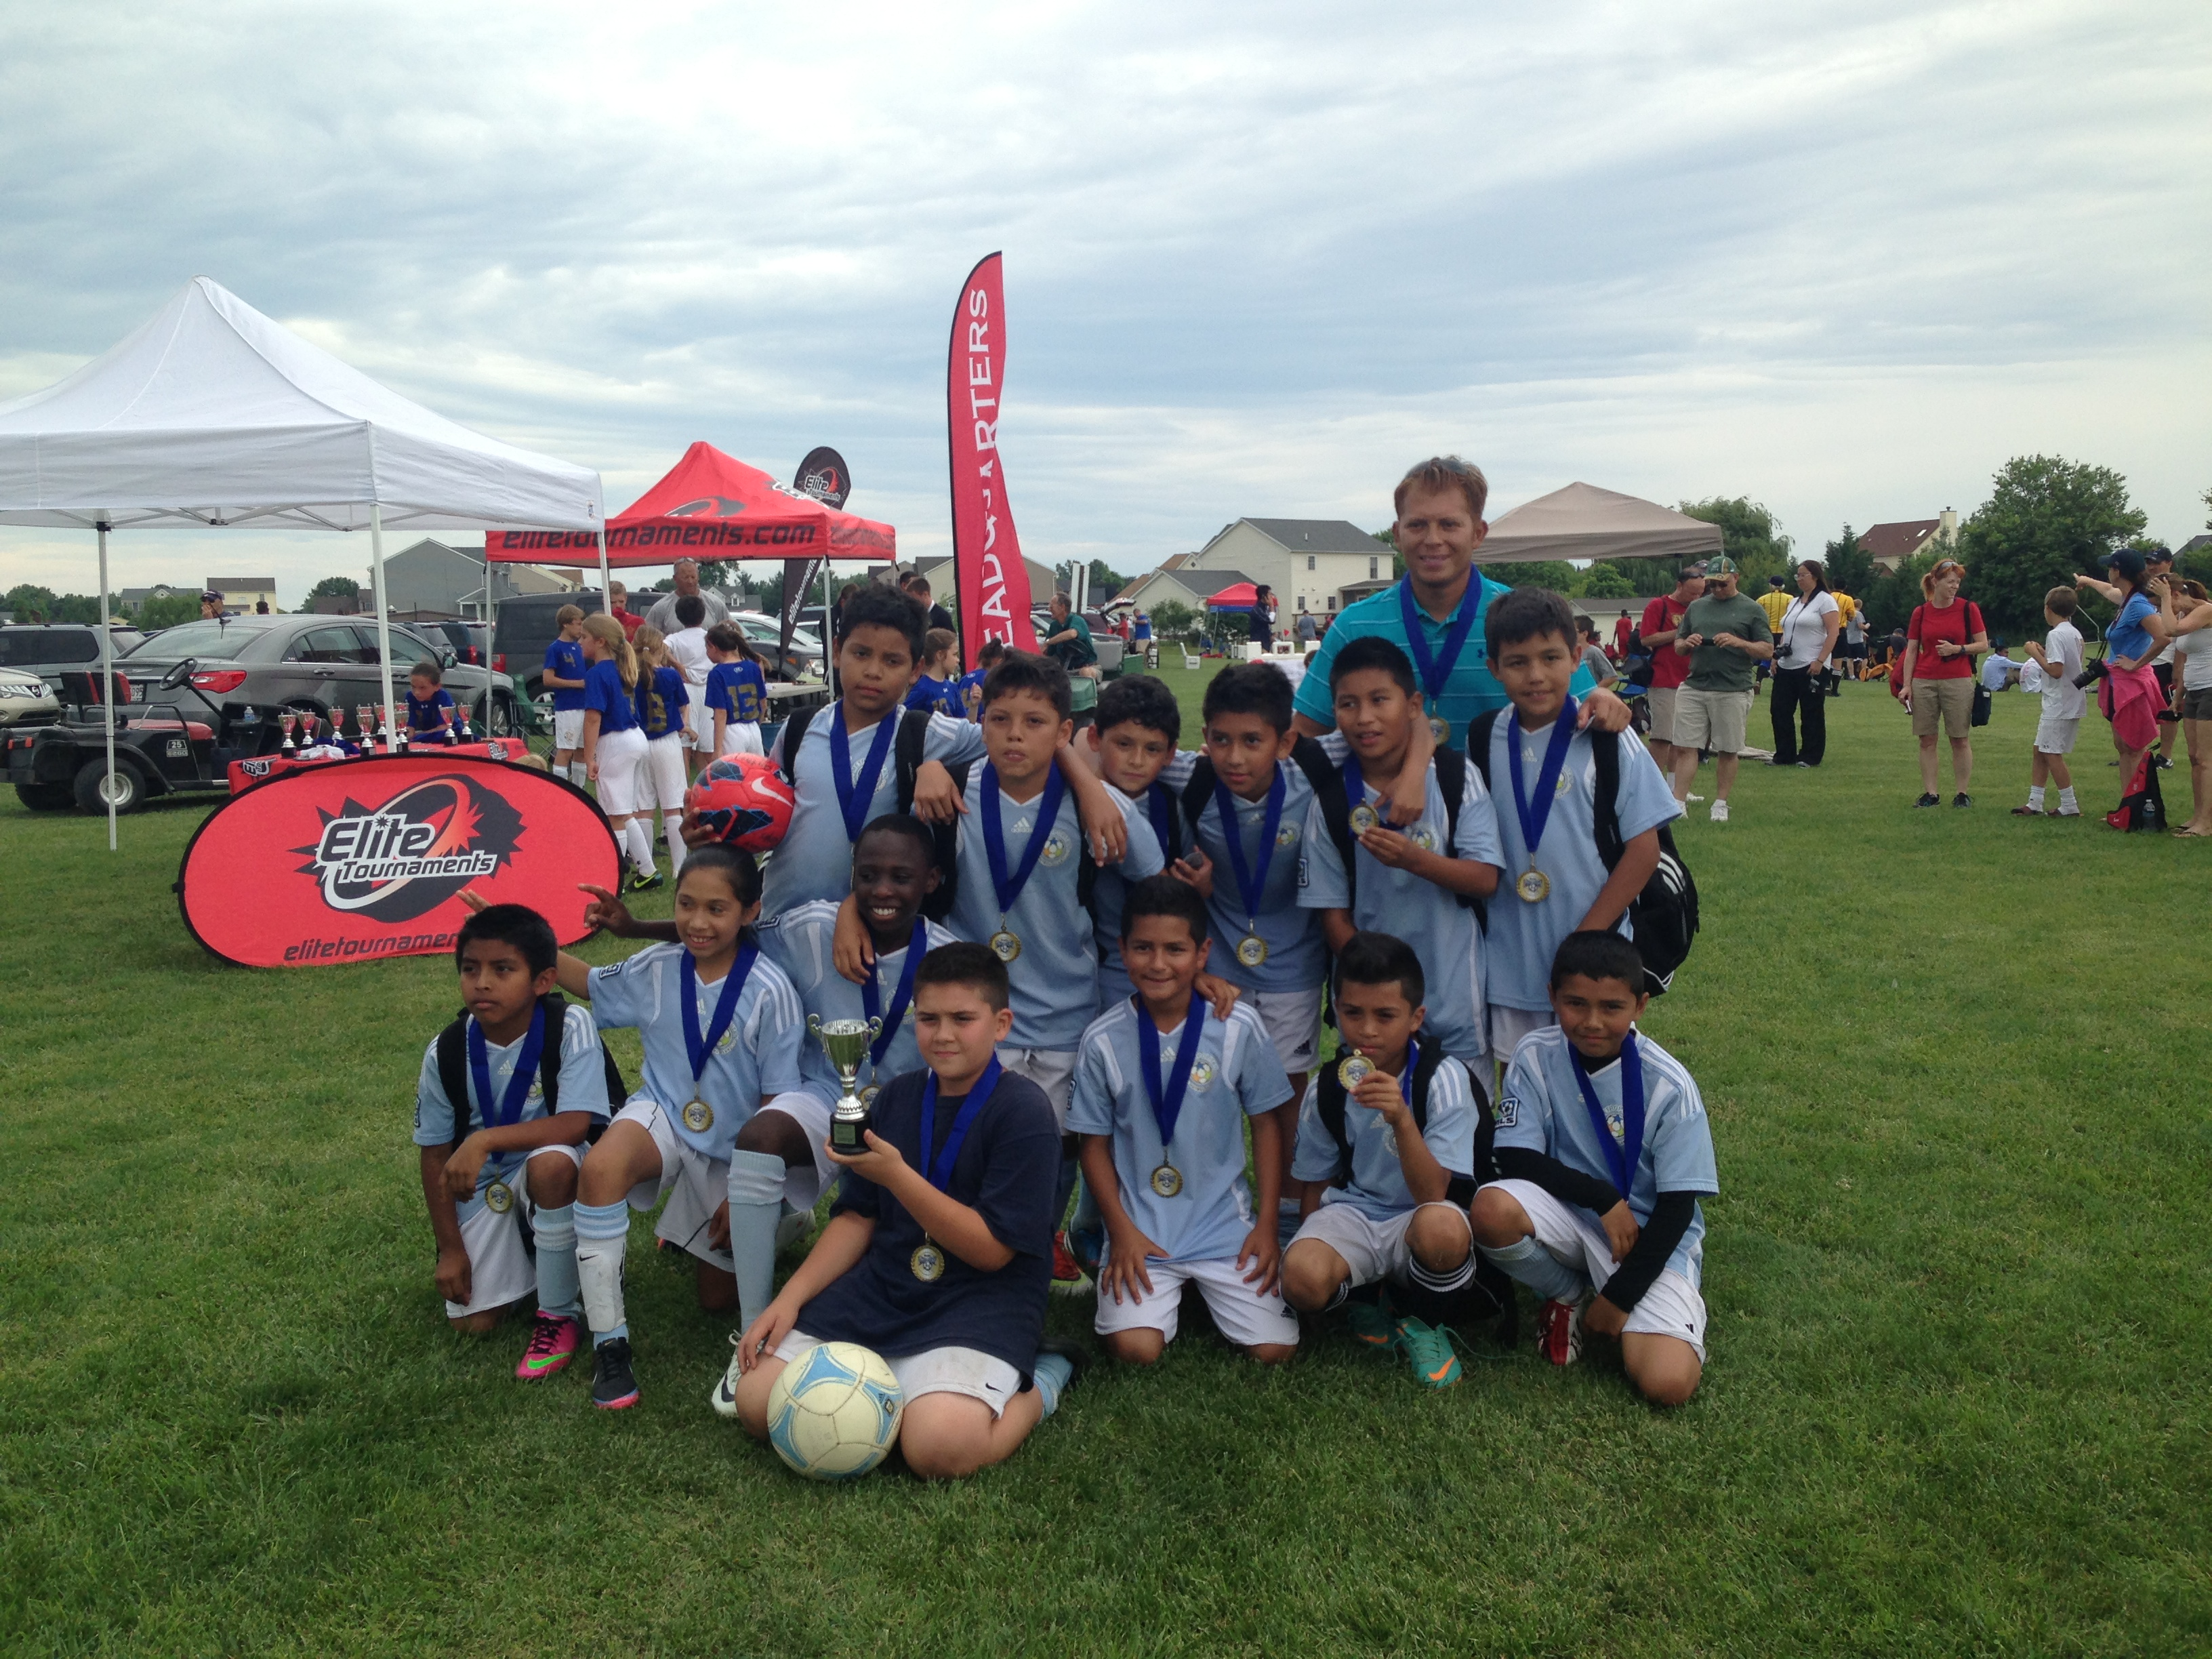 Mason Dixon Cup 2013 - Champions